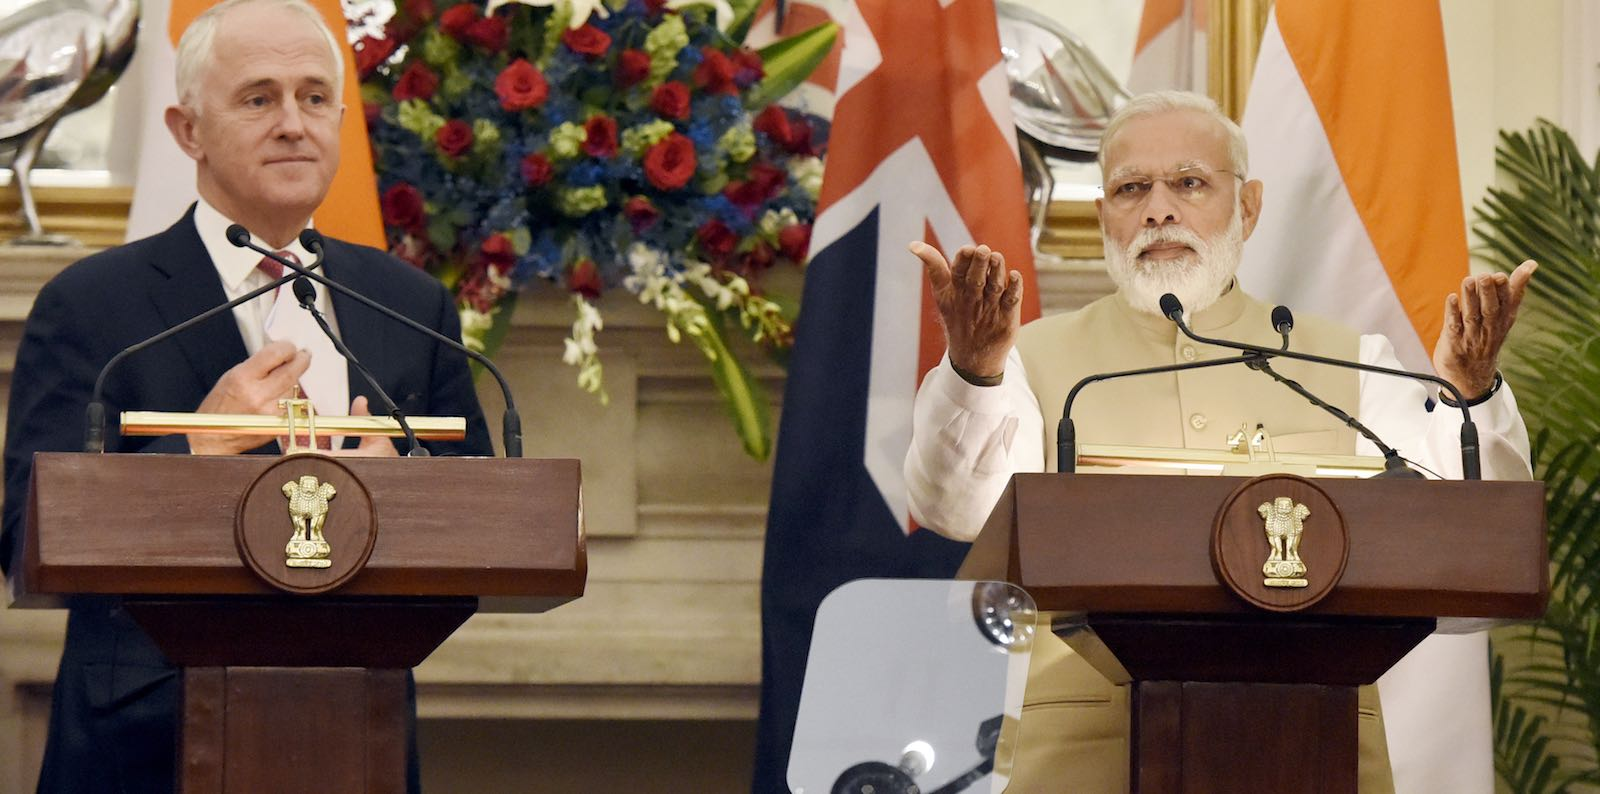 Indian Prime Minister Narendra Modi and Australian Prime Minister Malcolm Turnbull in New Delhi, India, April 2017 (Photo: Sonu Mehta via Getty)